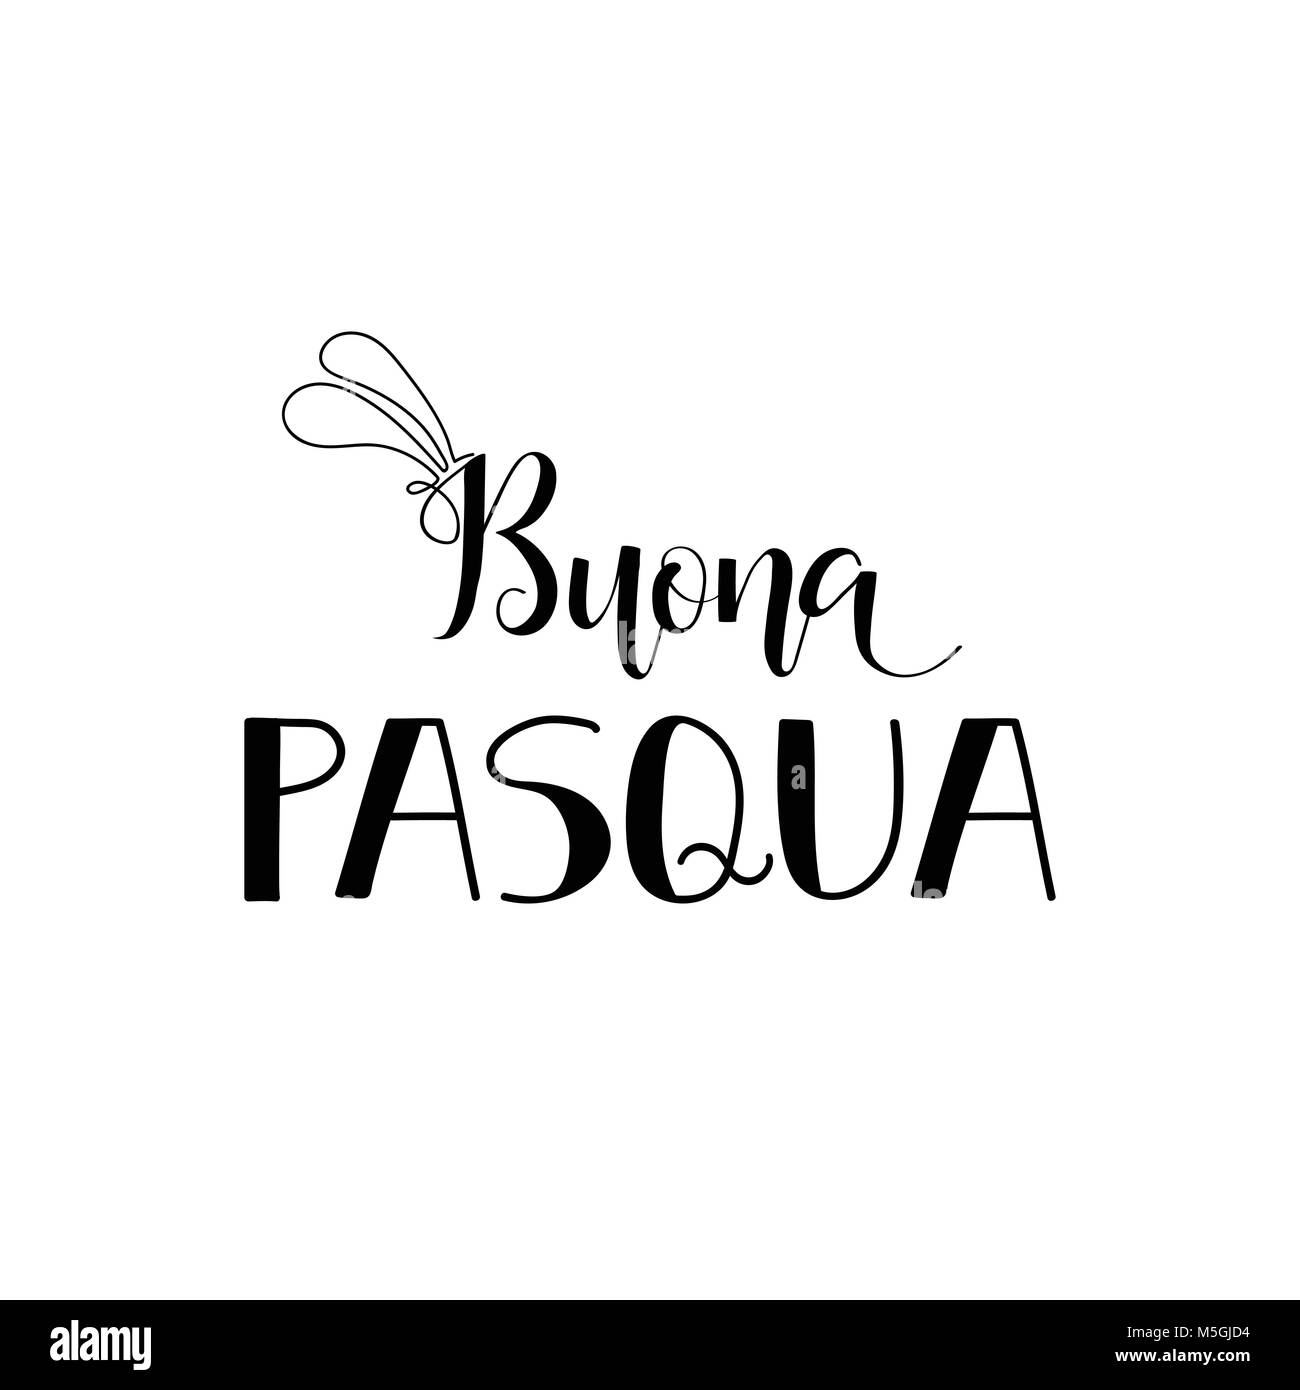 Buona Pasqua Lettering Translation From Italian Happy Easter